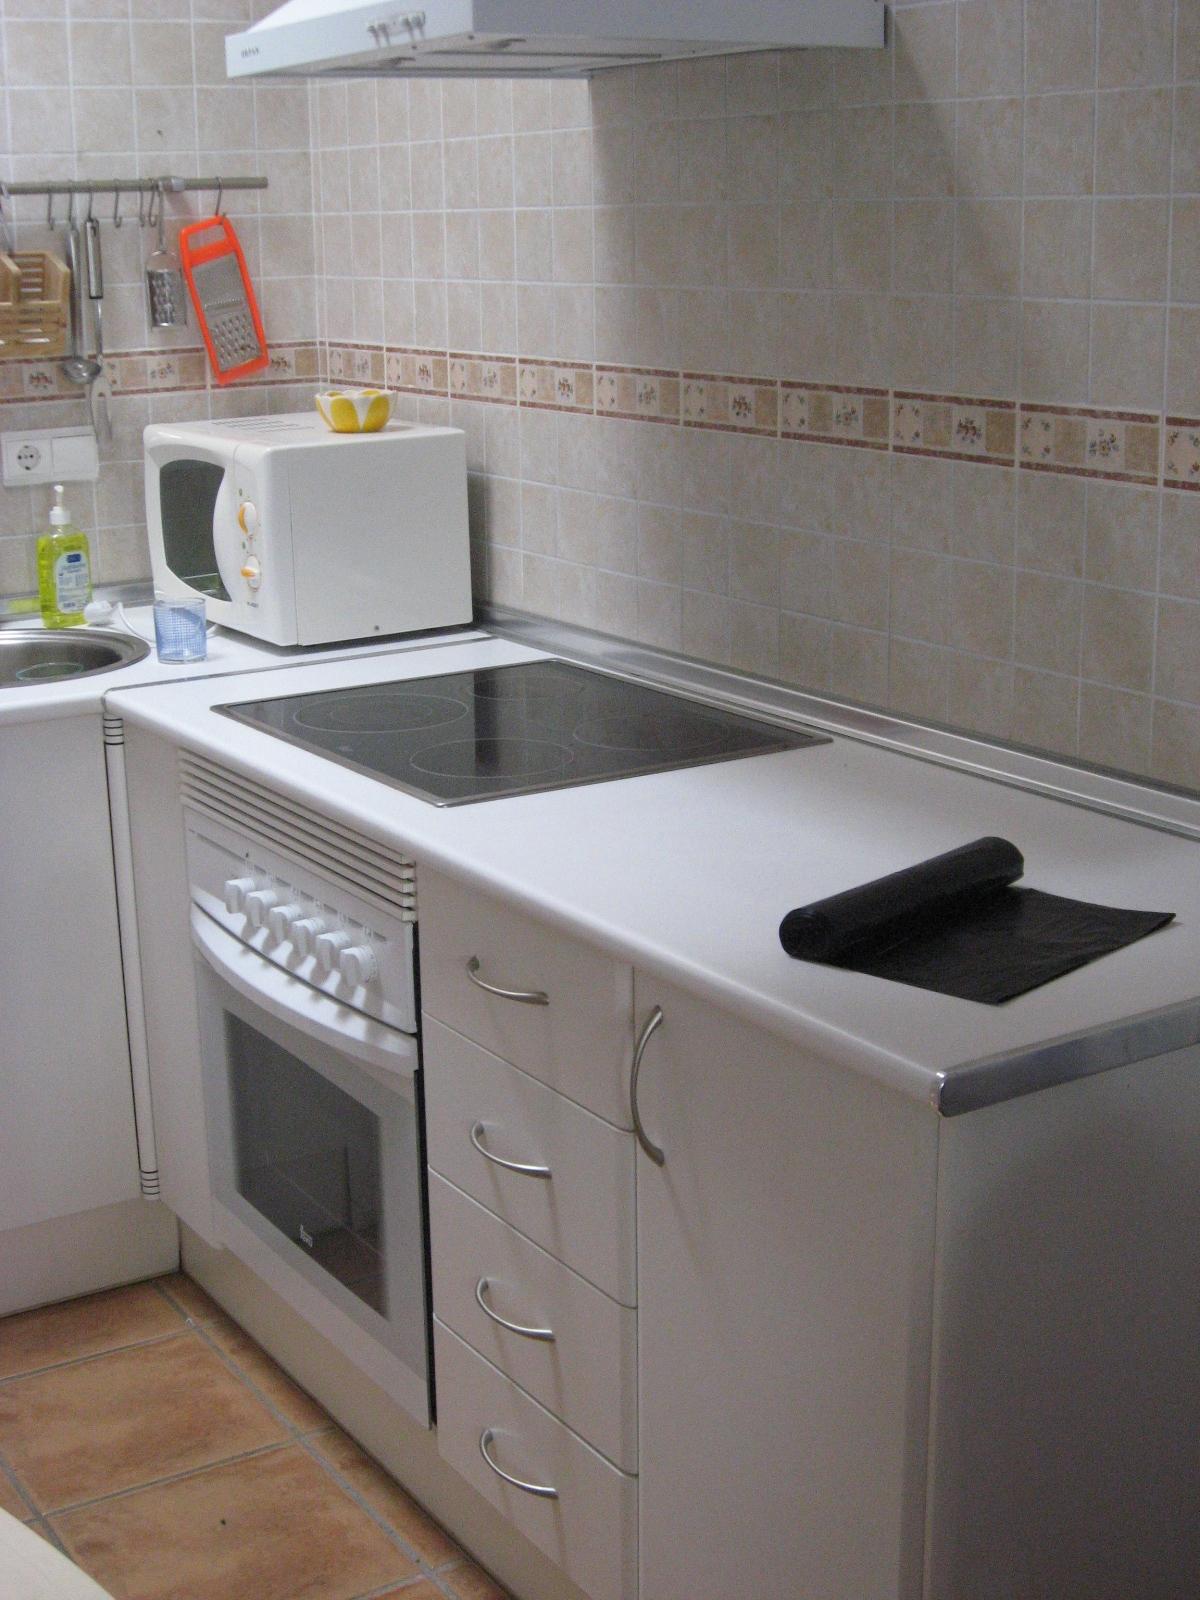 Full equiped kitchen - Cuisine totalement équipée - Cocina totalmente equipada